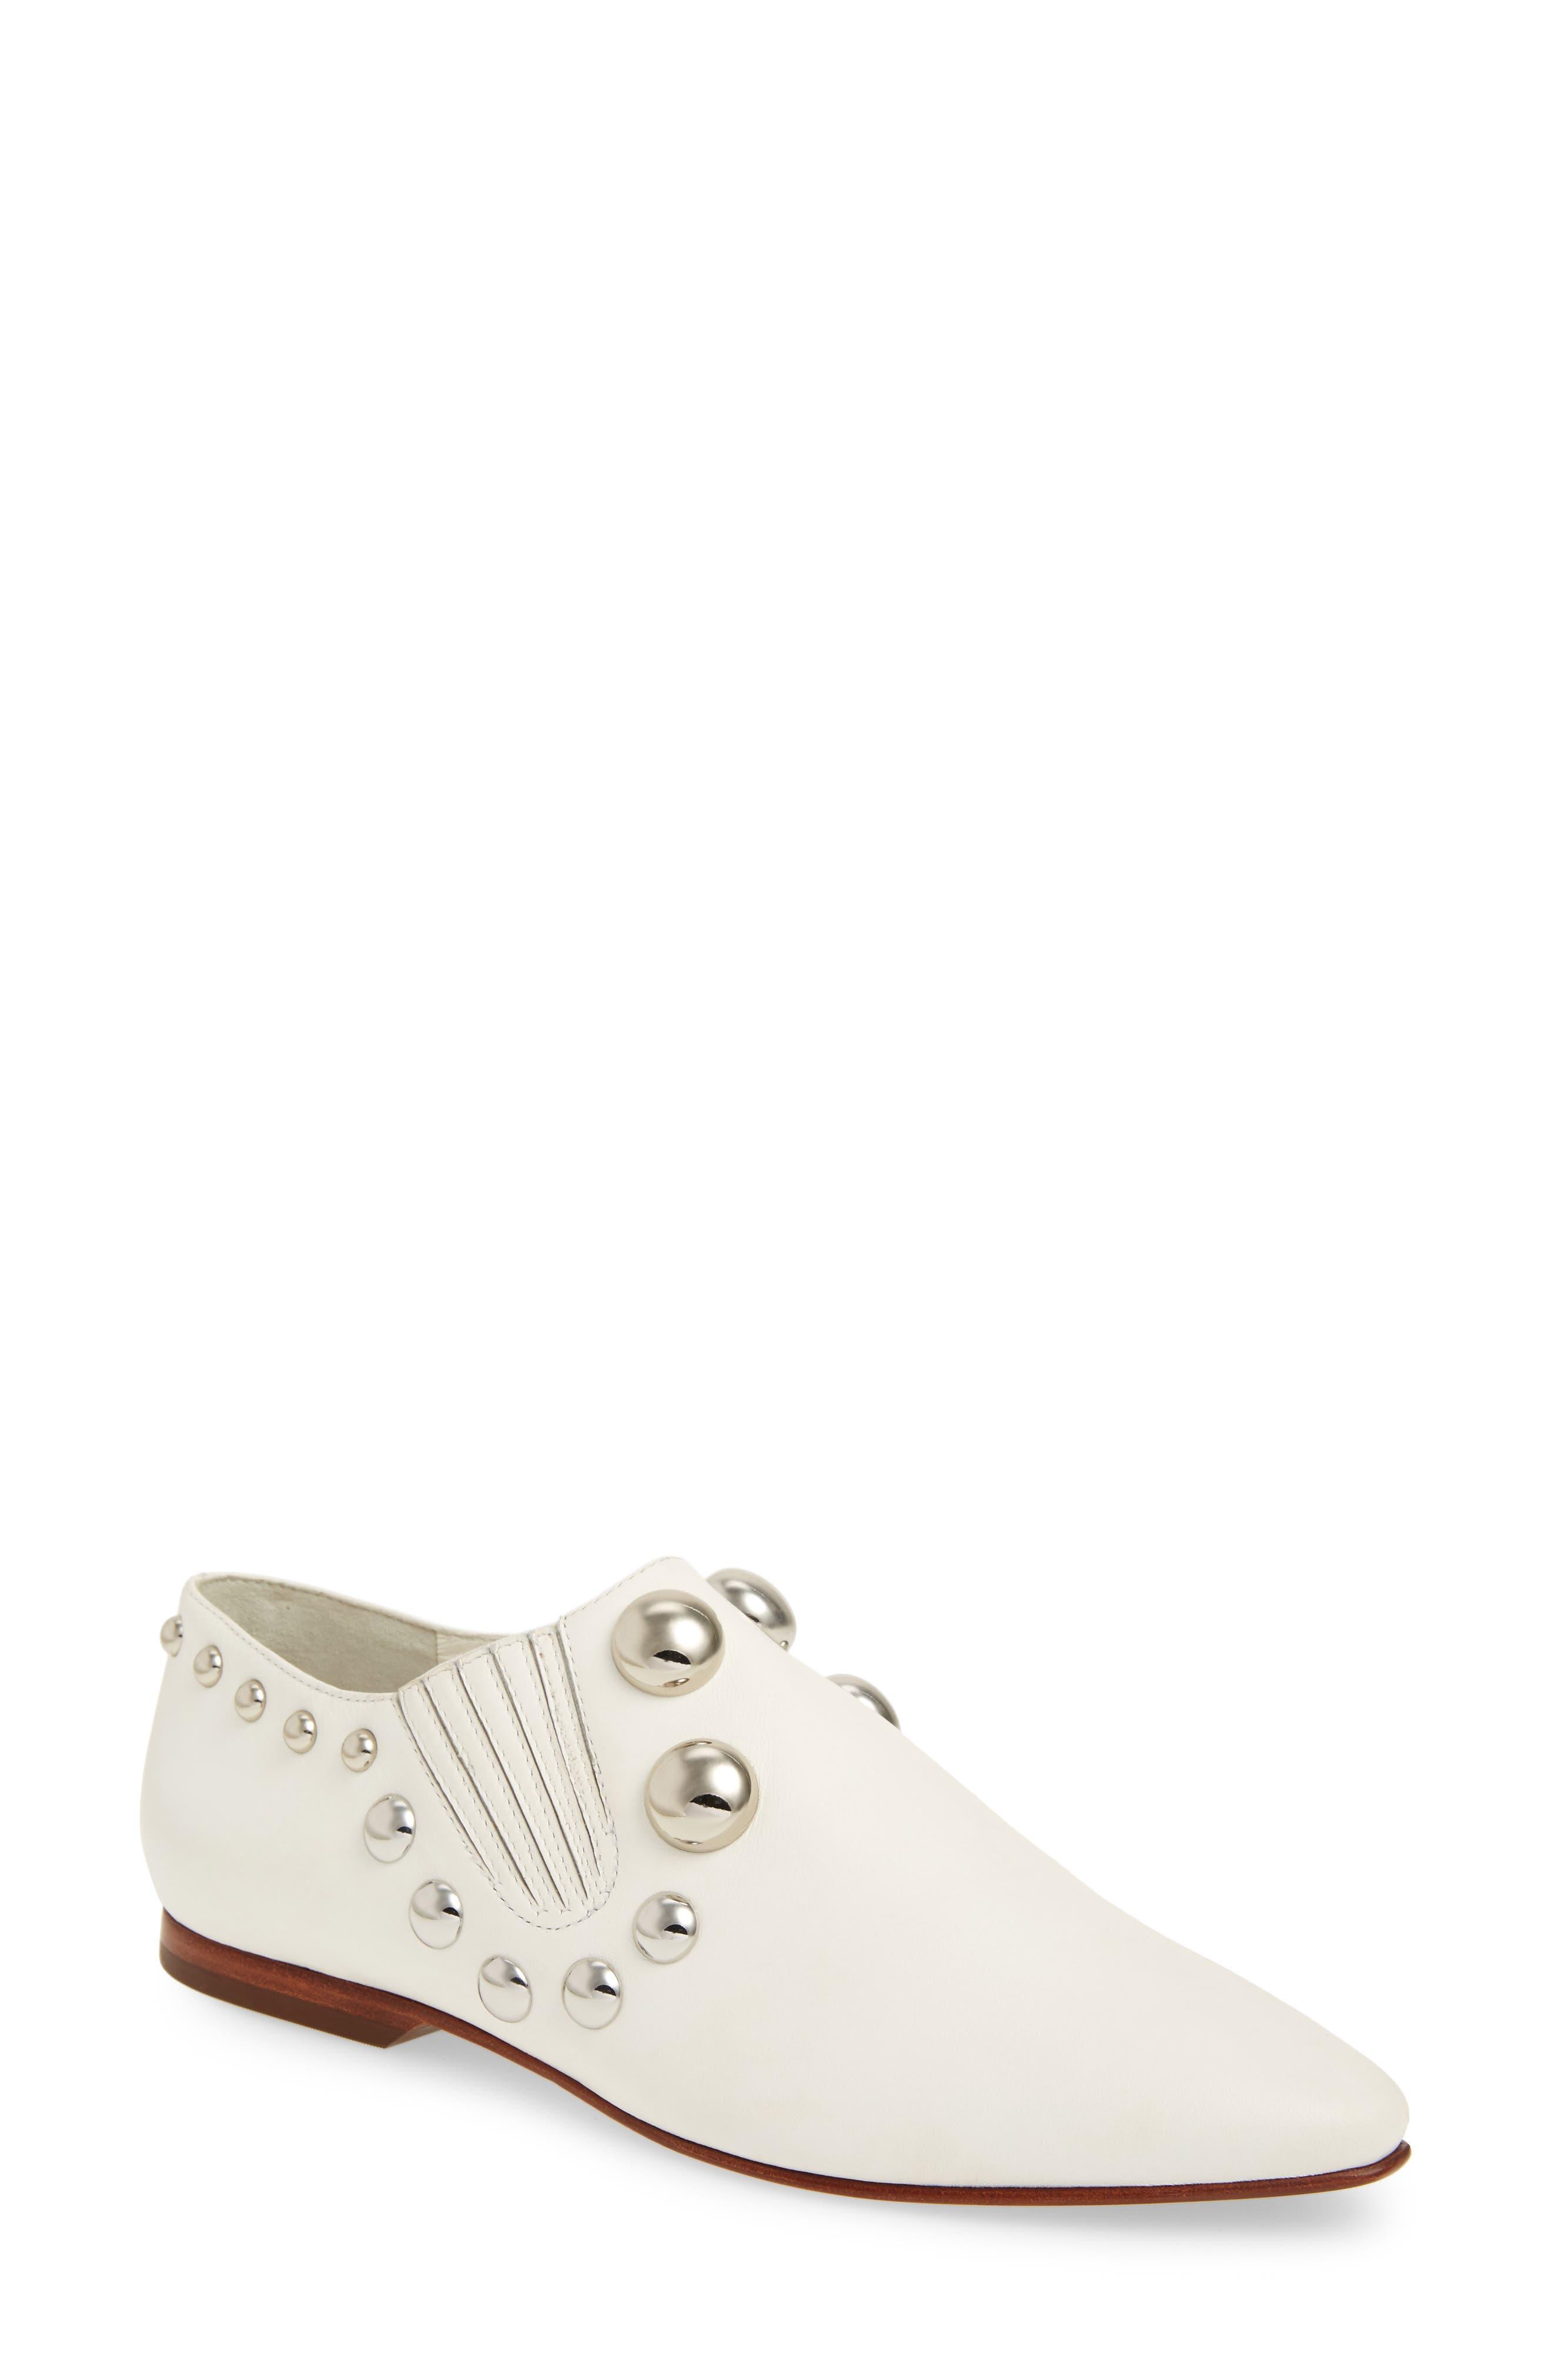 Blythe Studded Loafer,                             Main thumbnail 1, color,                             White